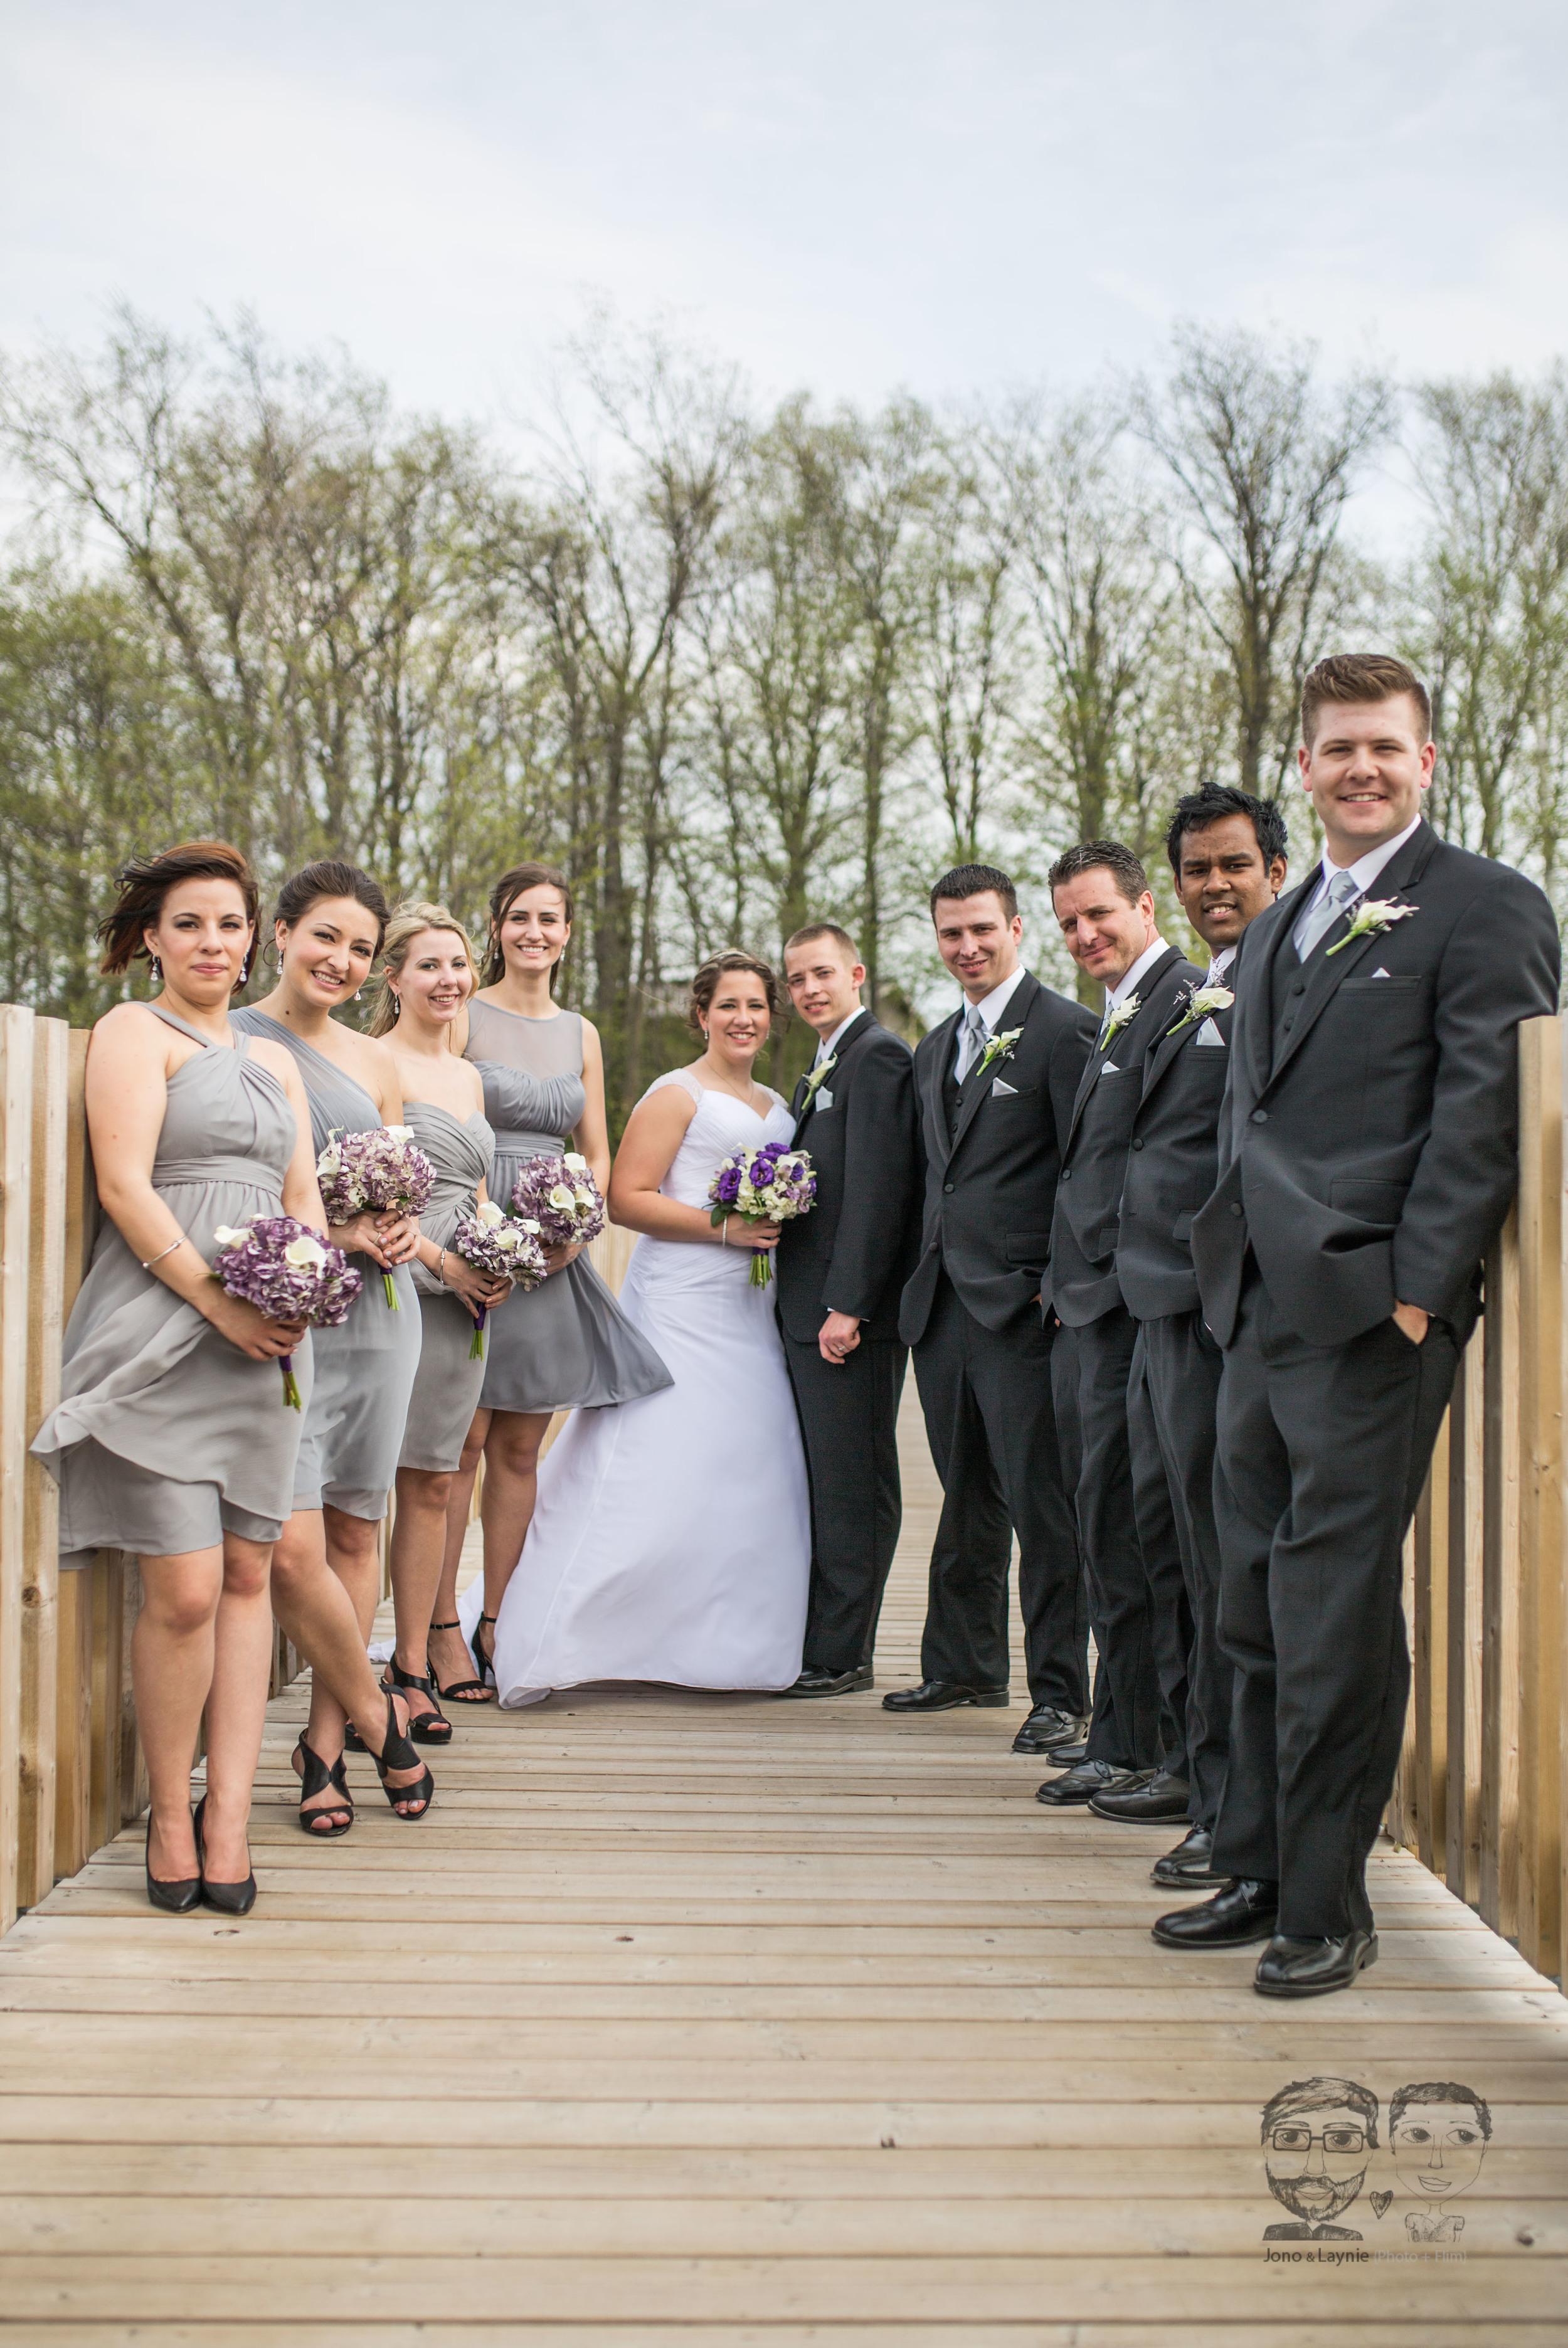 30Toronto Wedding Photographers and Videographers-Jono & Laynie Co.-Orangeville Wedding.jpg